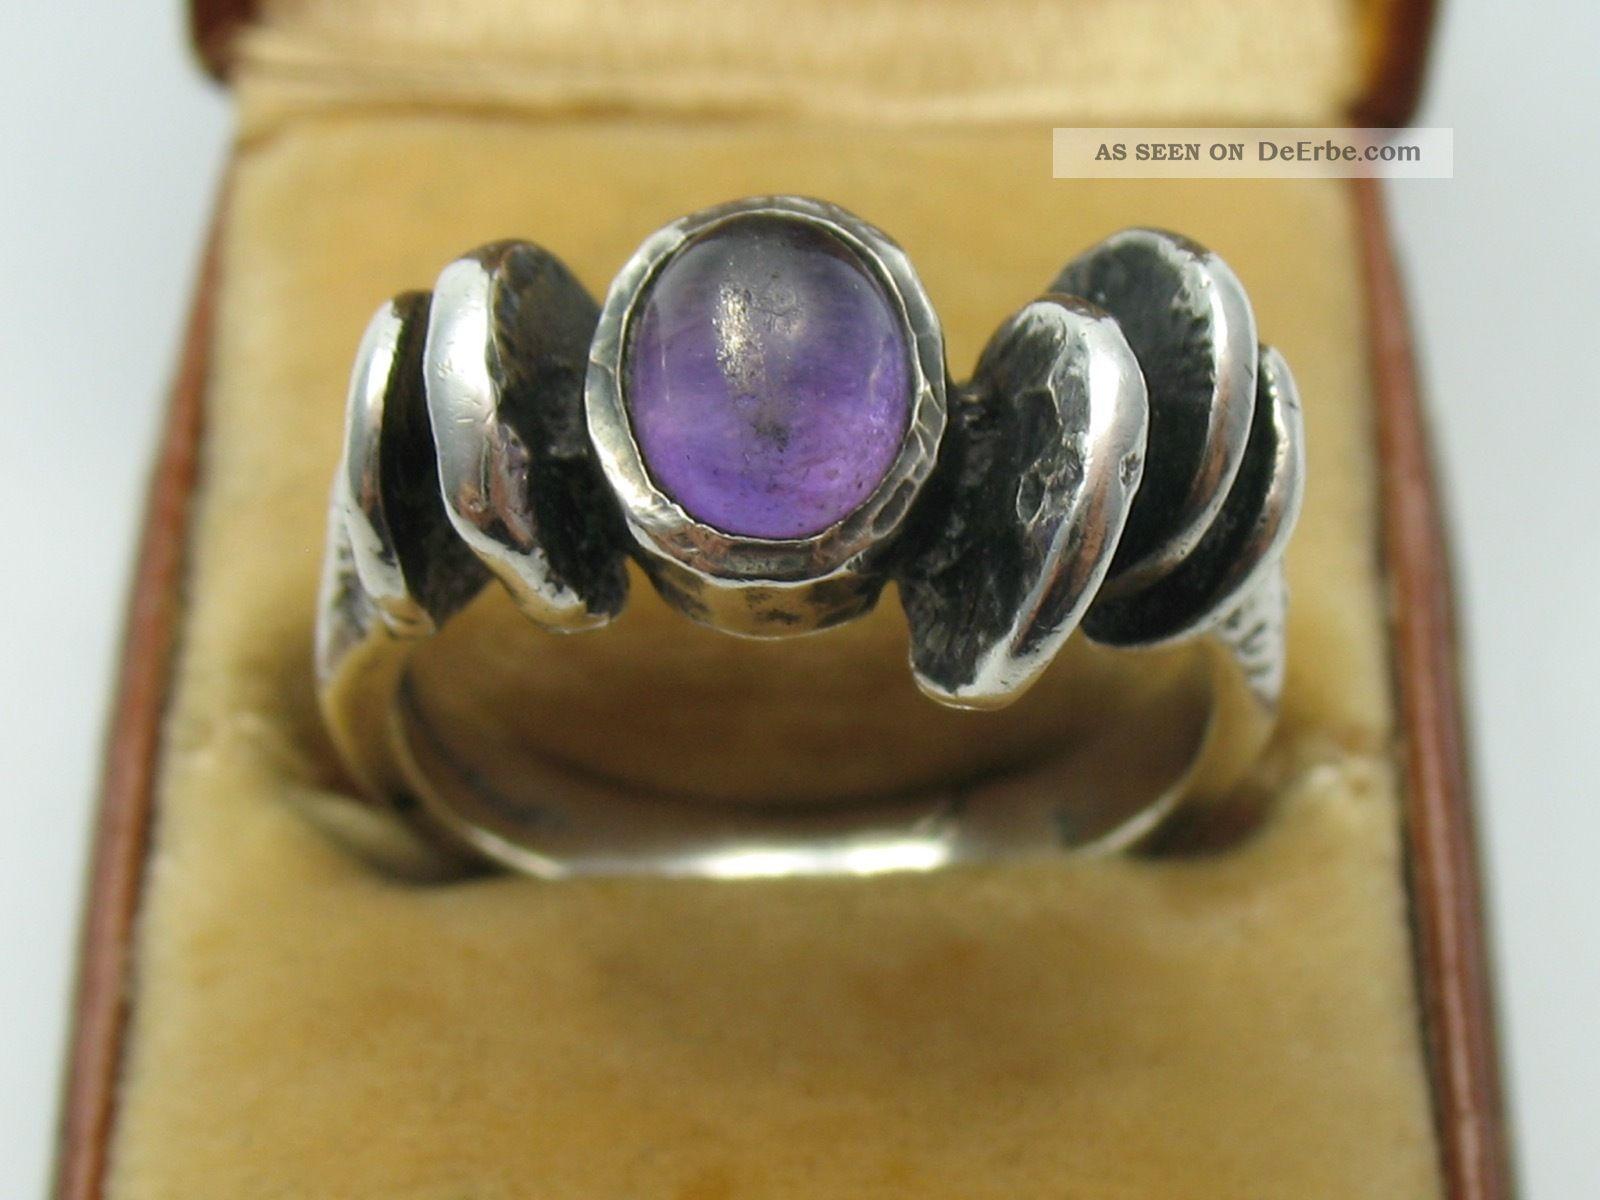 Handarbeit Vintage Modernist Amethyst Ring Im Oly Stil Aus 925 Silber Ringe Bild